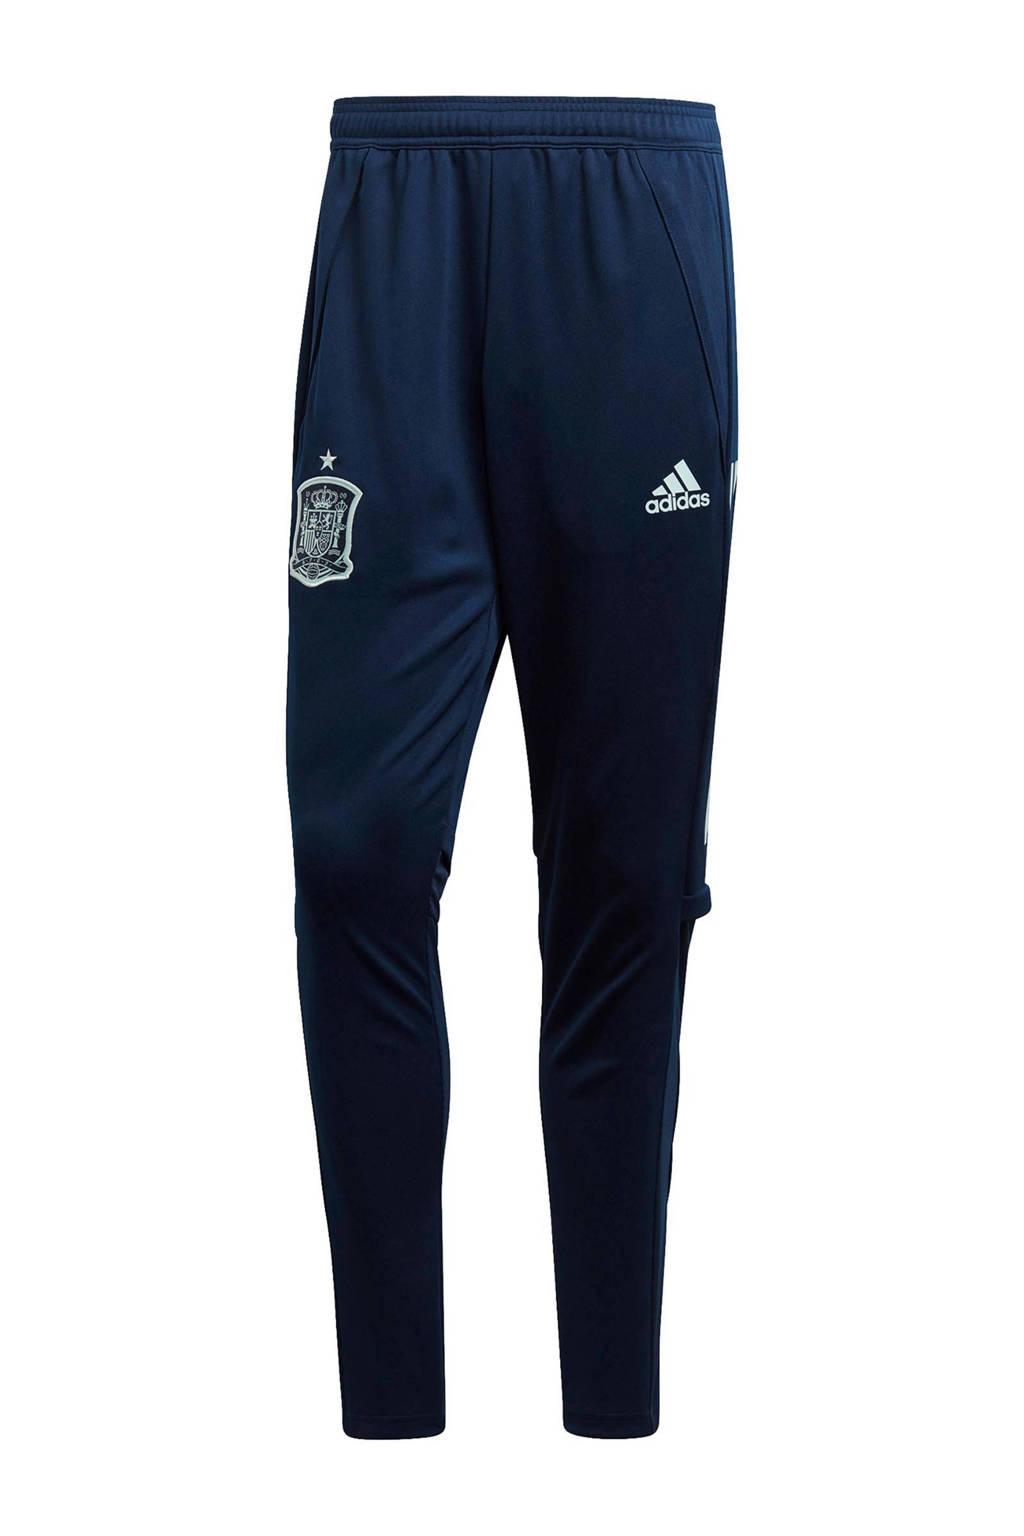 adidas Senior Spanje sportbroek Training, Donkerblauw